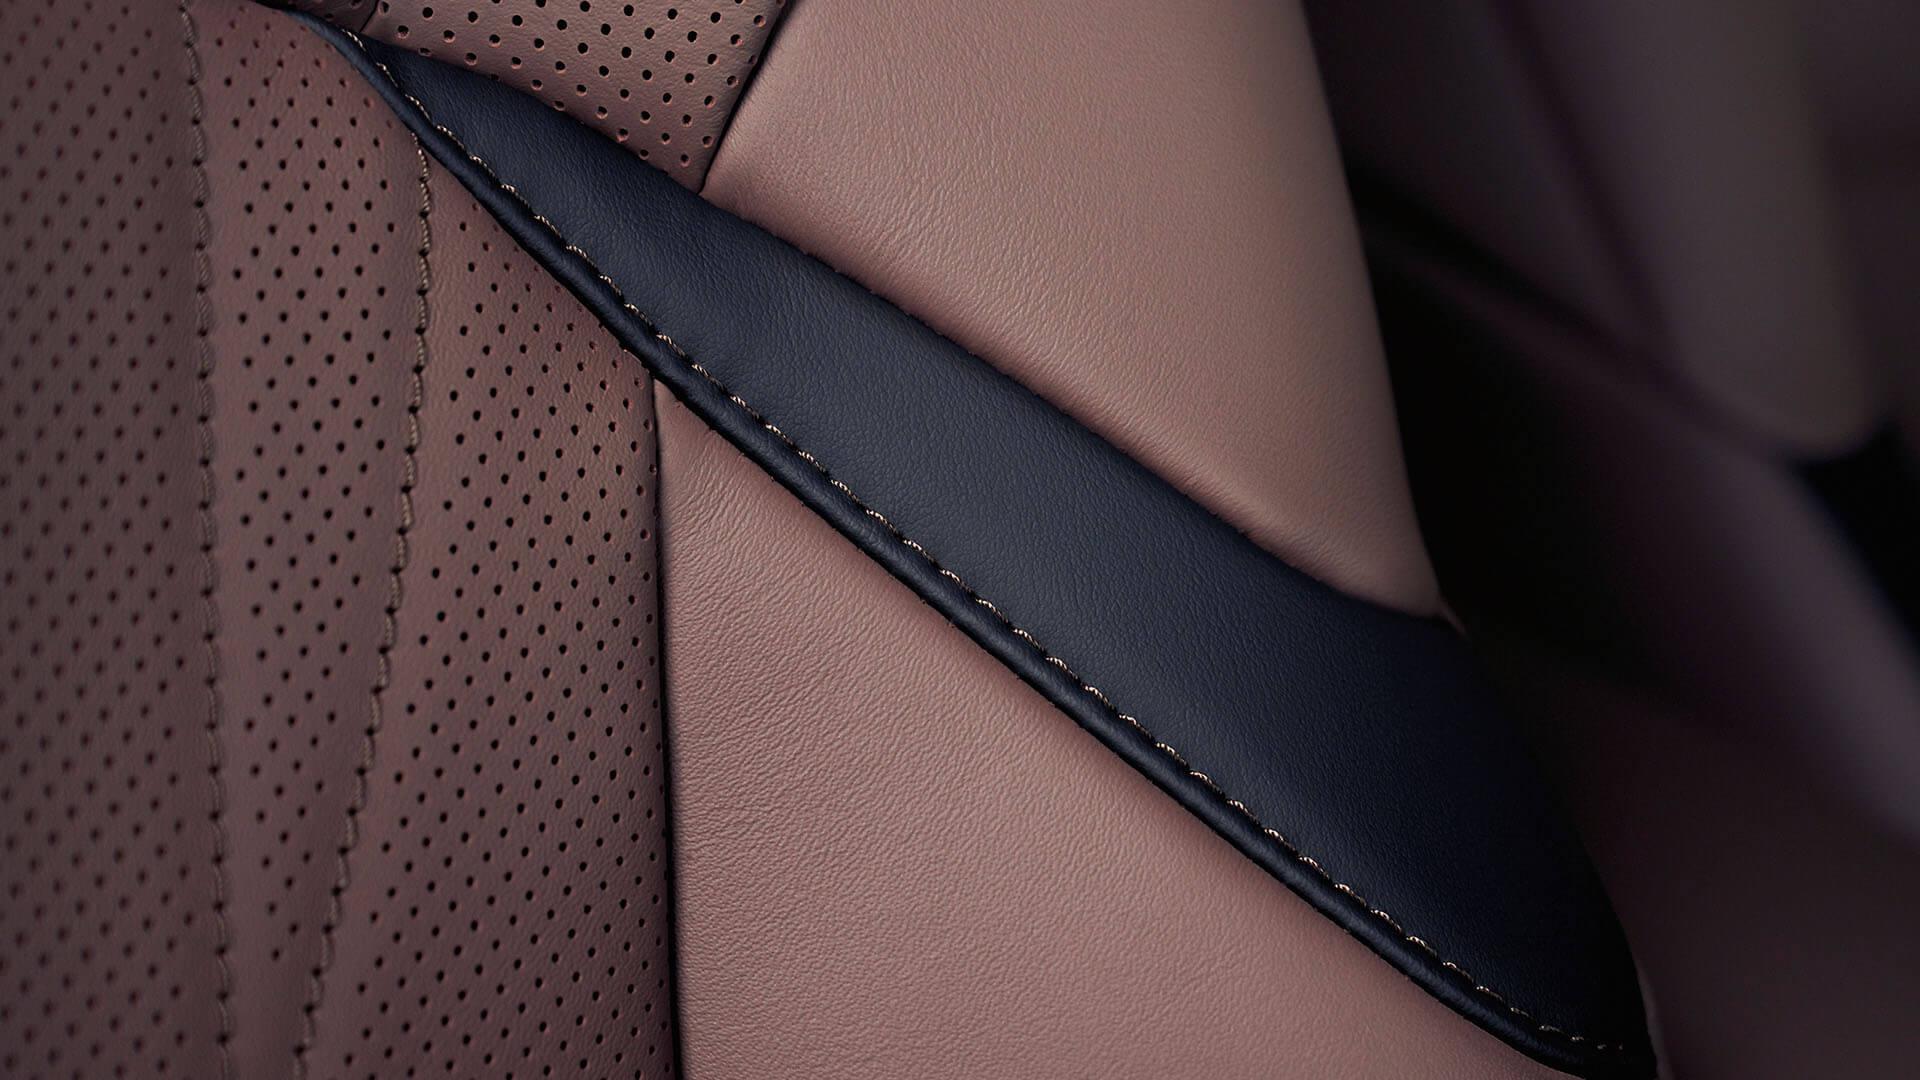 2022 lexus es experience interior back new provocative elegance colour scheme